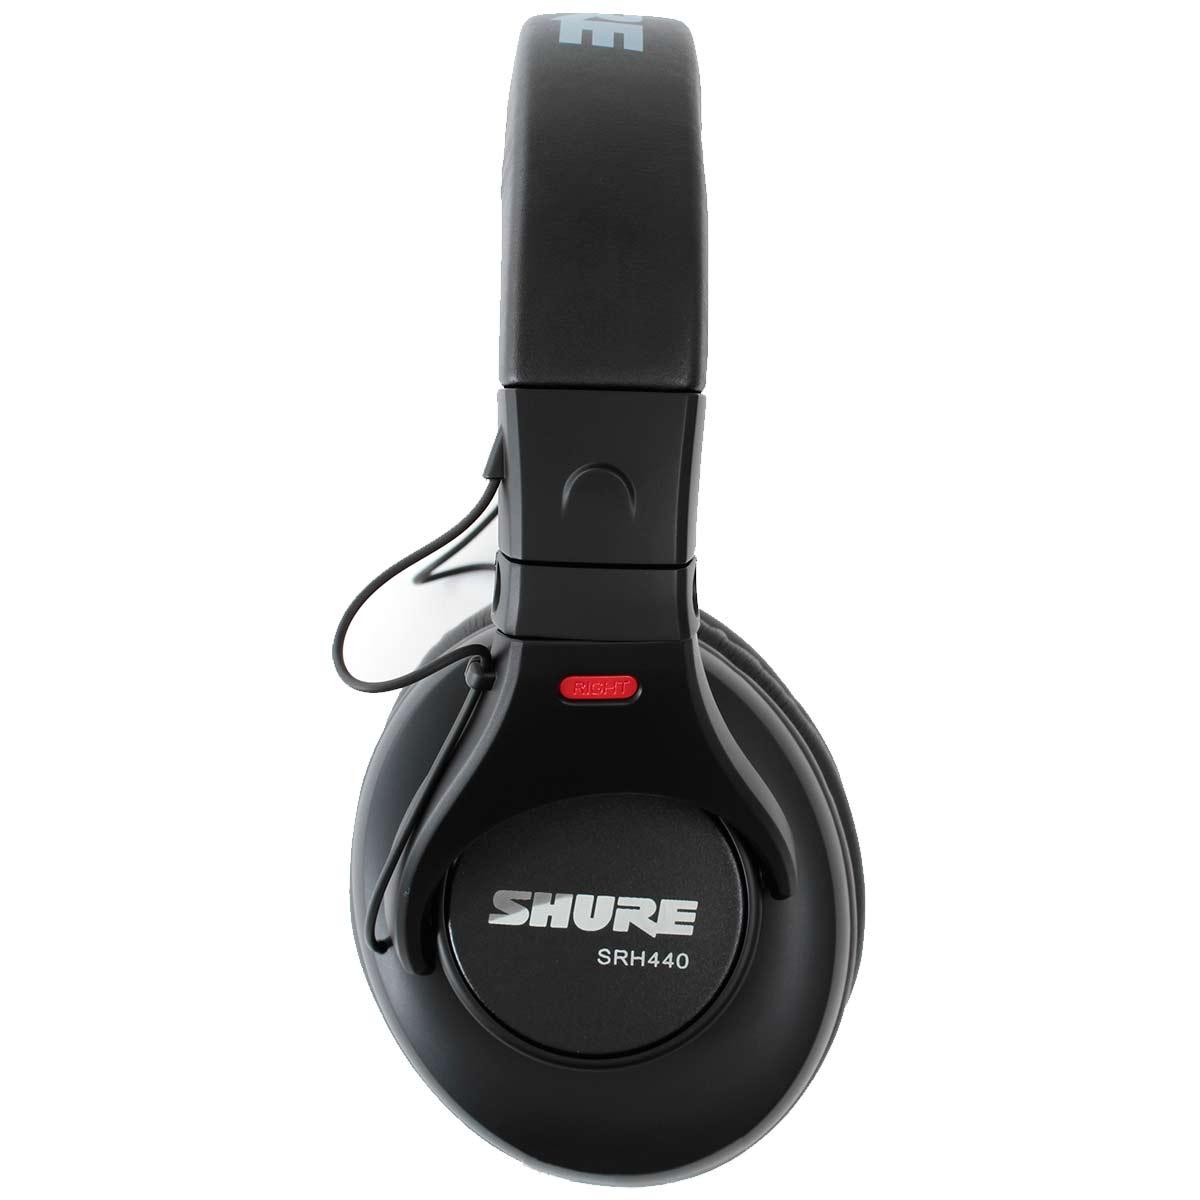 Fone de Ouvido Over-ear 10 Hz - 22 KHz 44 Ohms - SRH 440 Shure